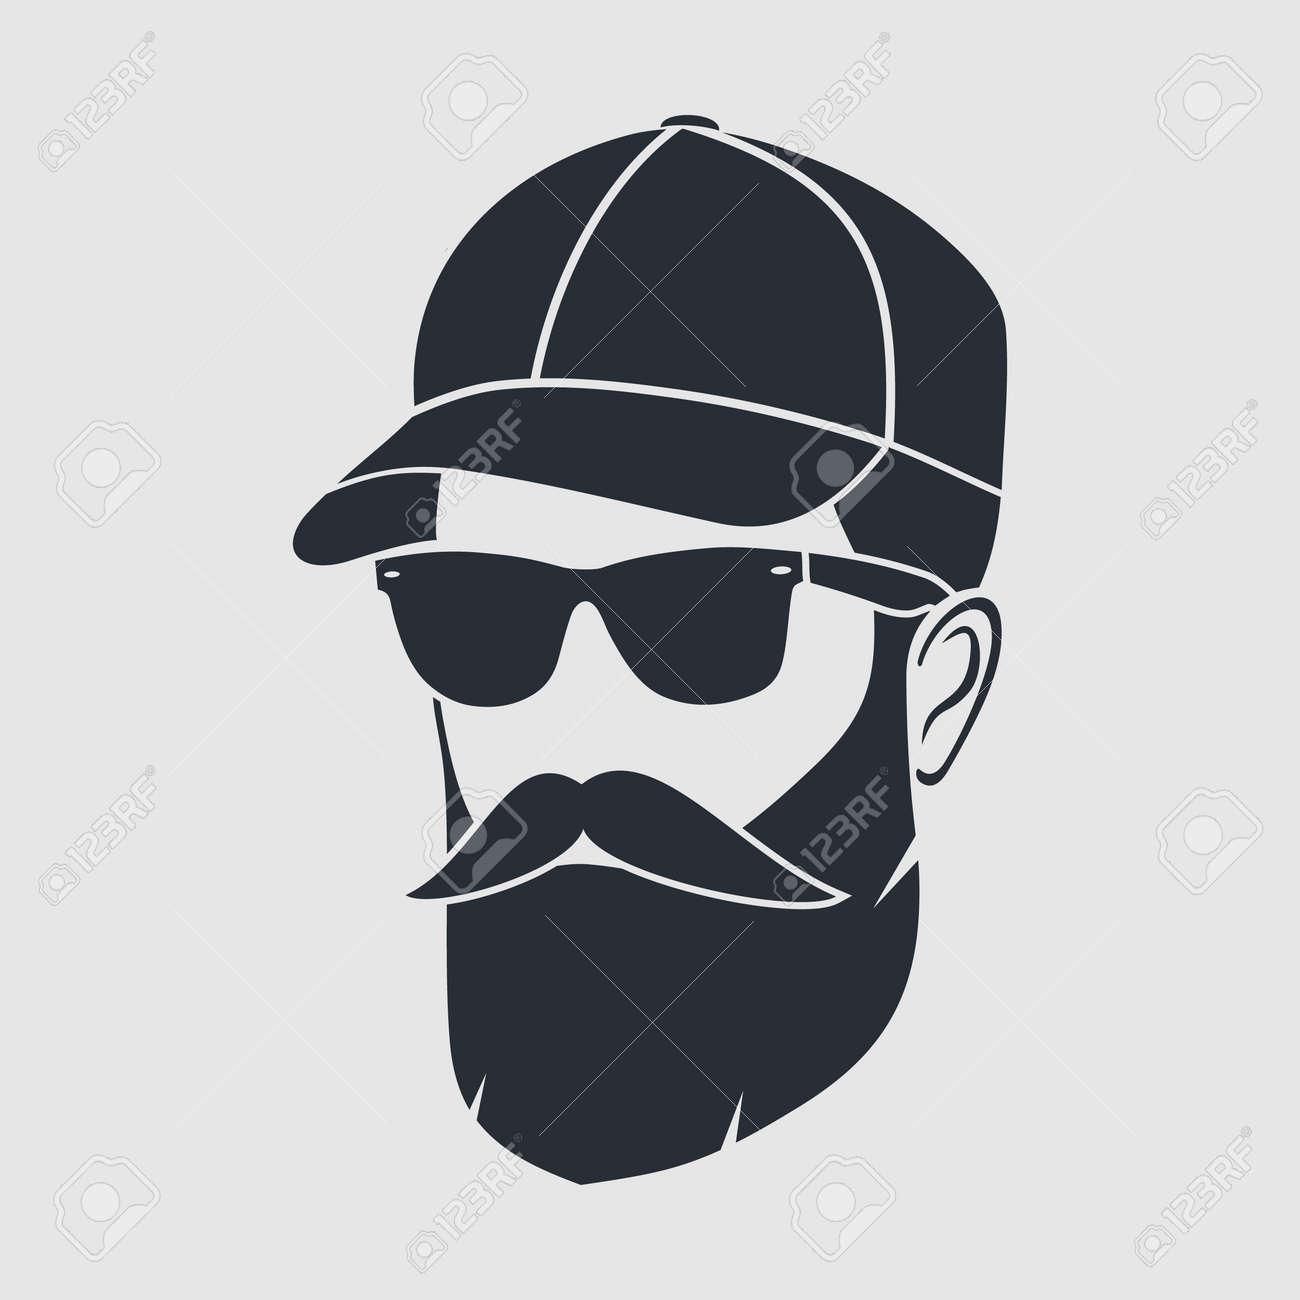 Bearded men in a baseball cap. Hipster face icon - 171378359